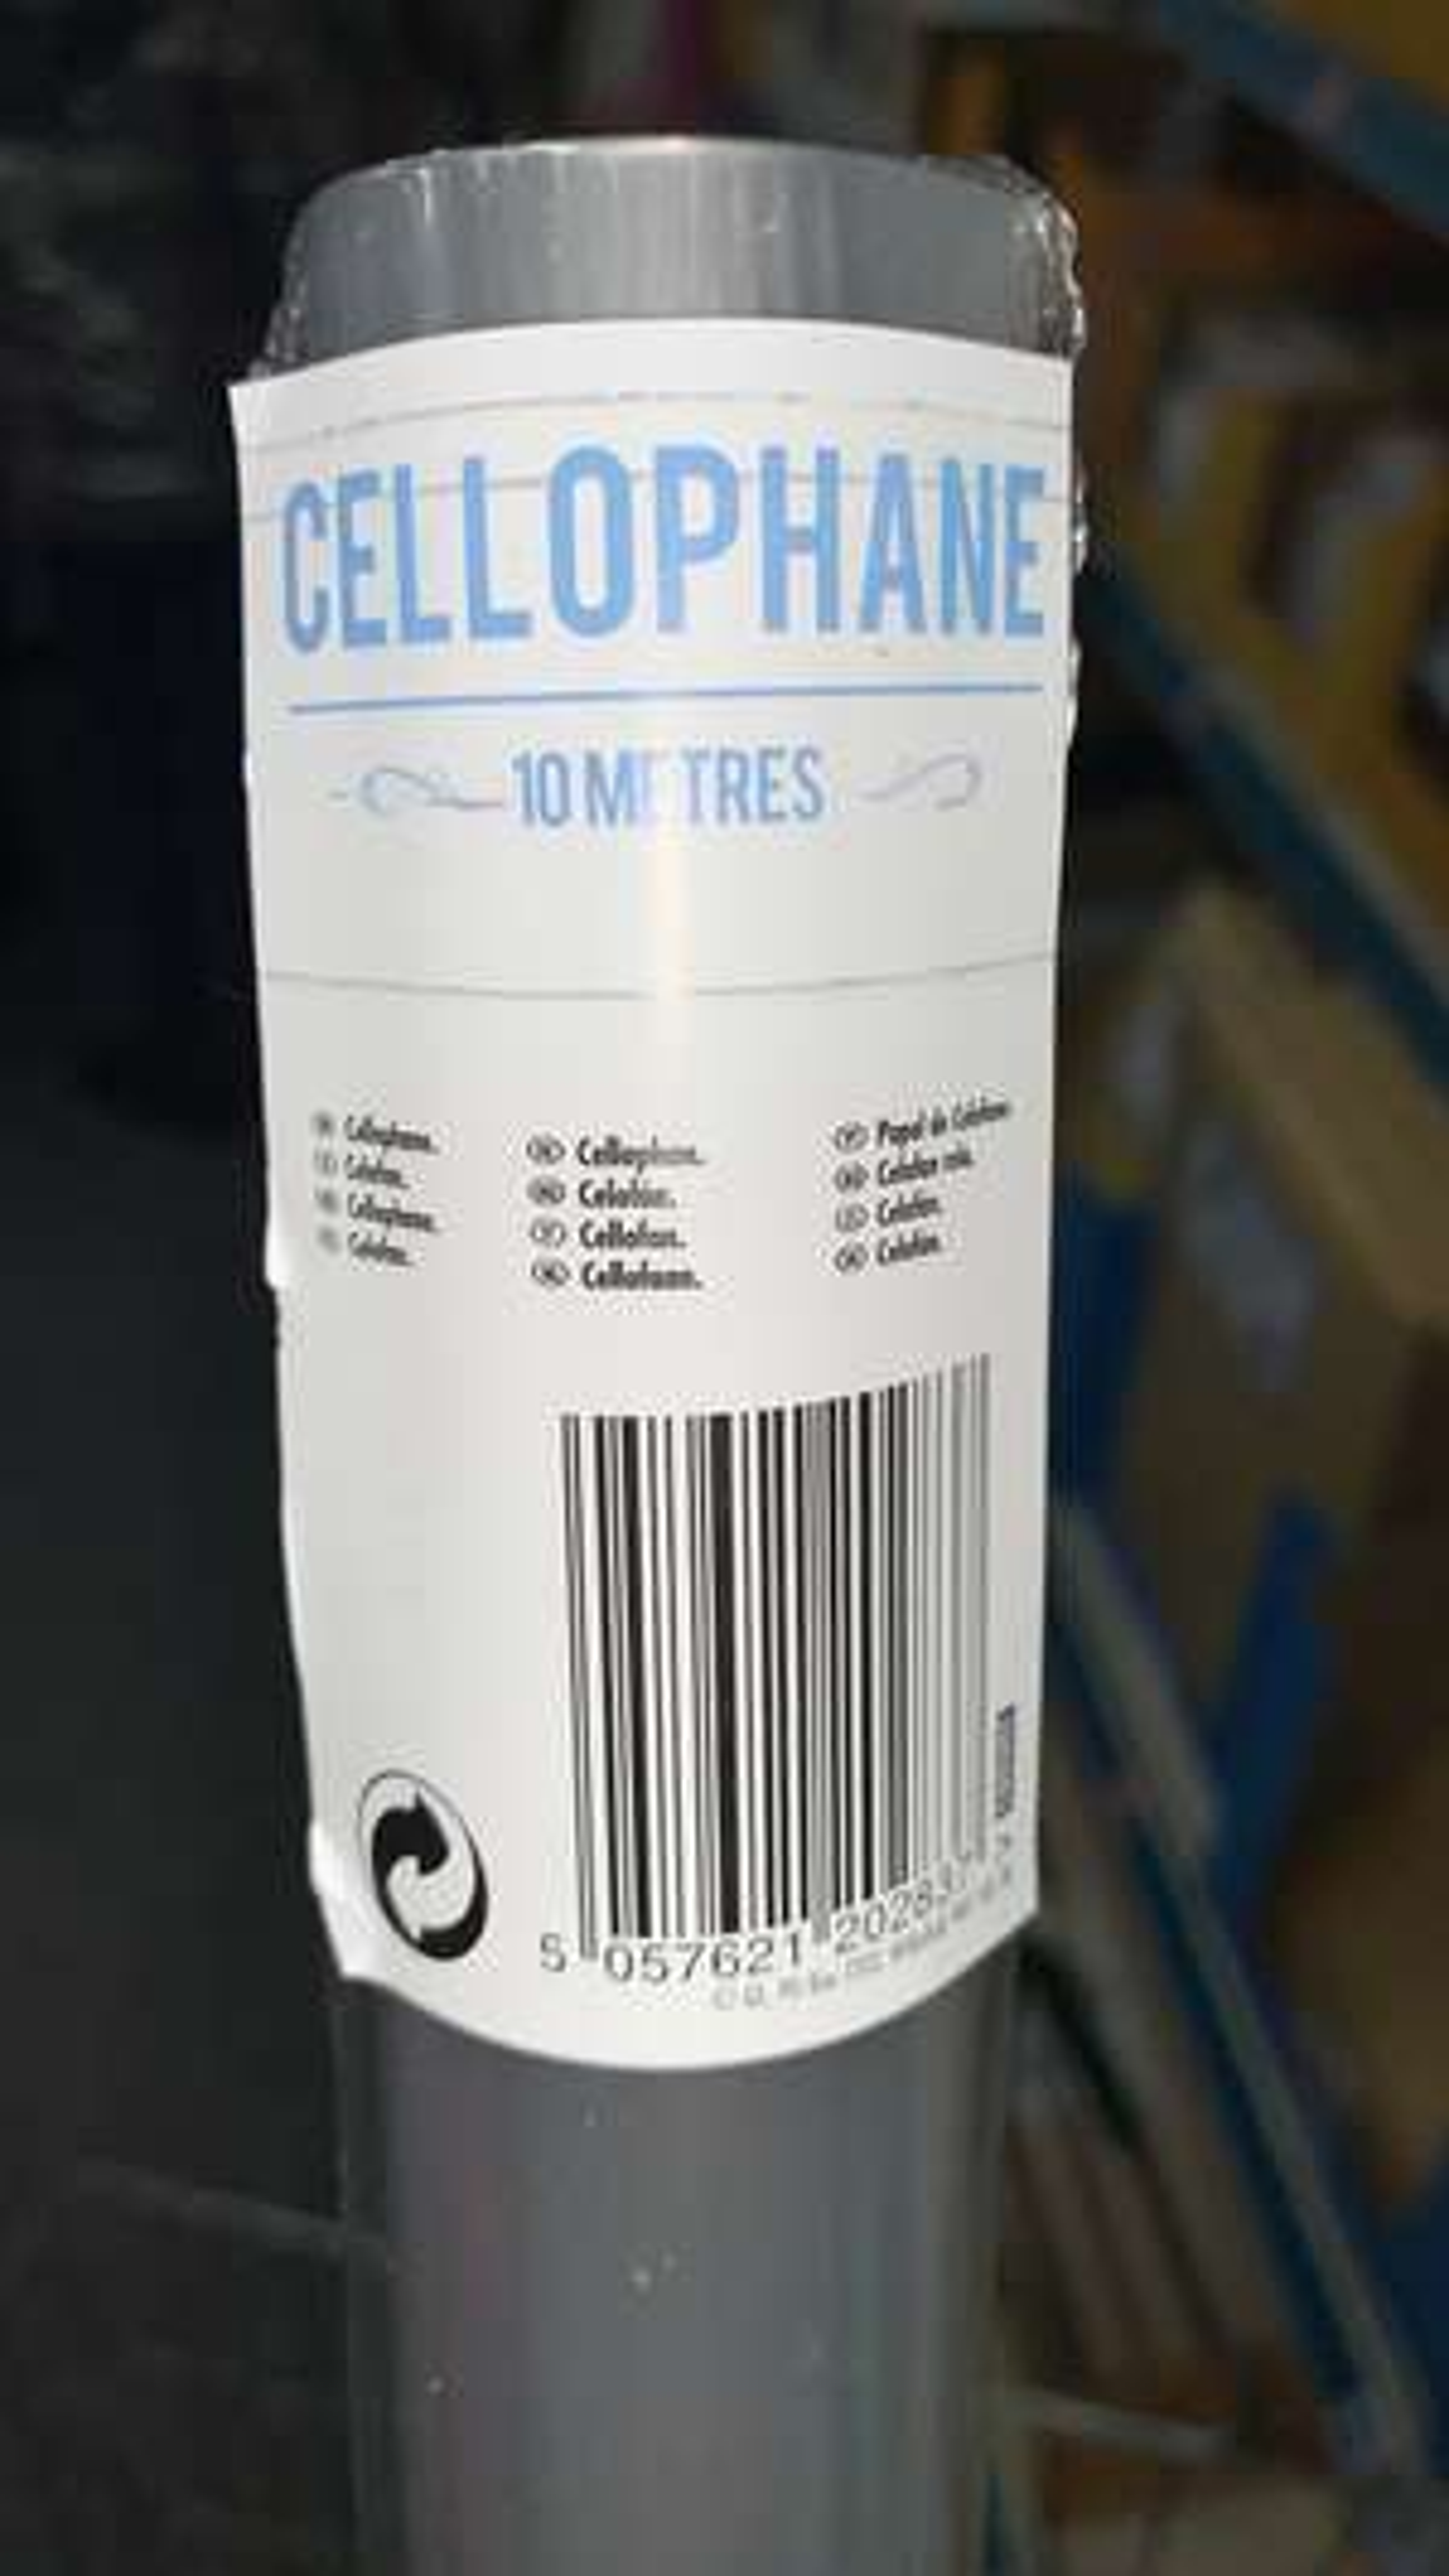 10 Metres of Cellophane £1 @ Poundland